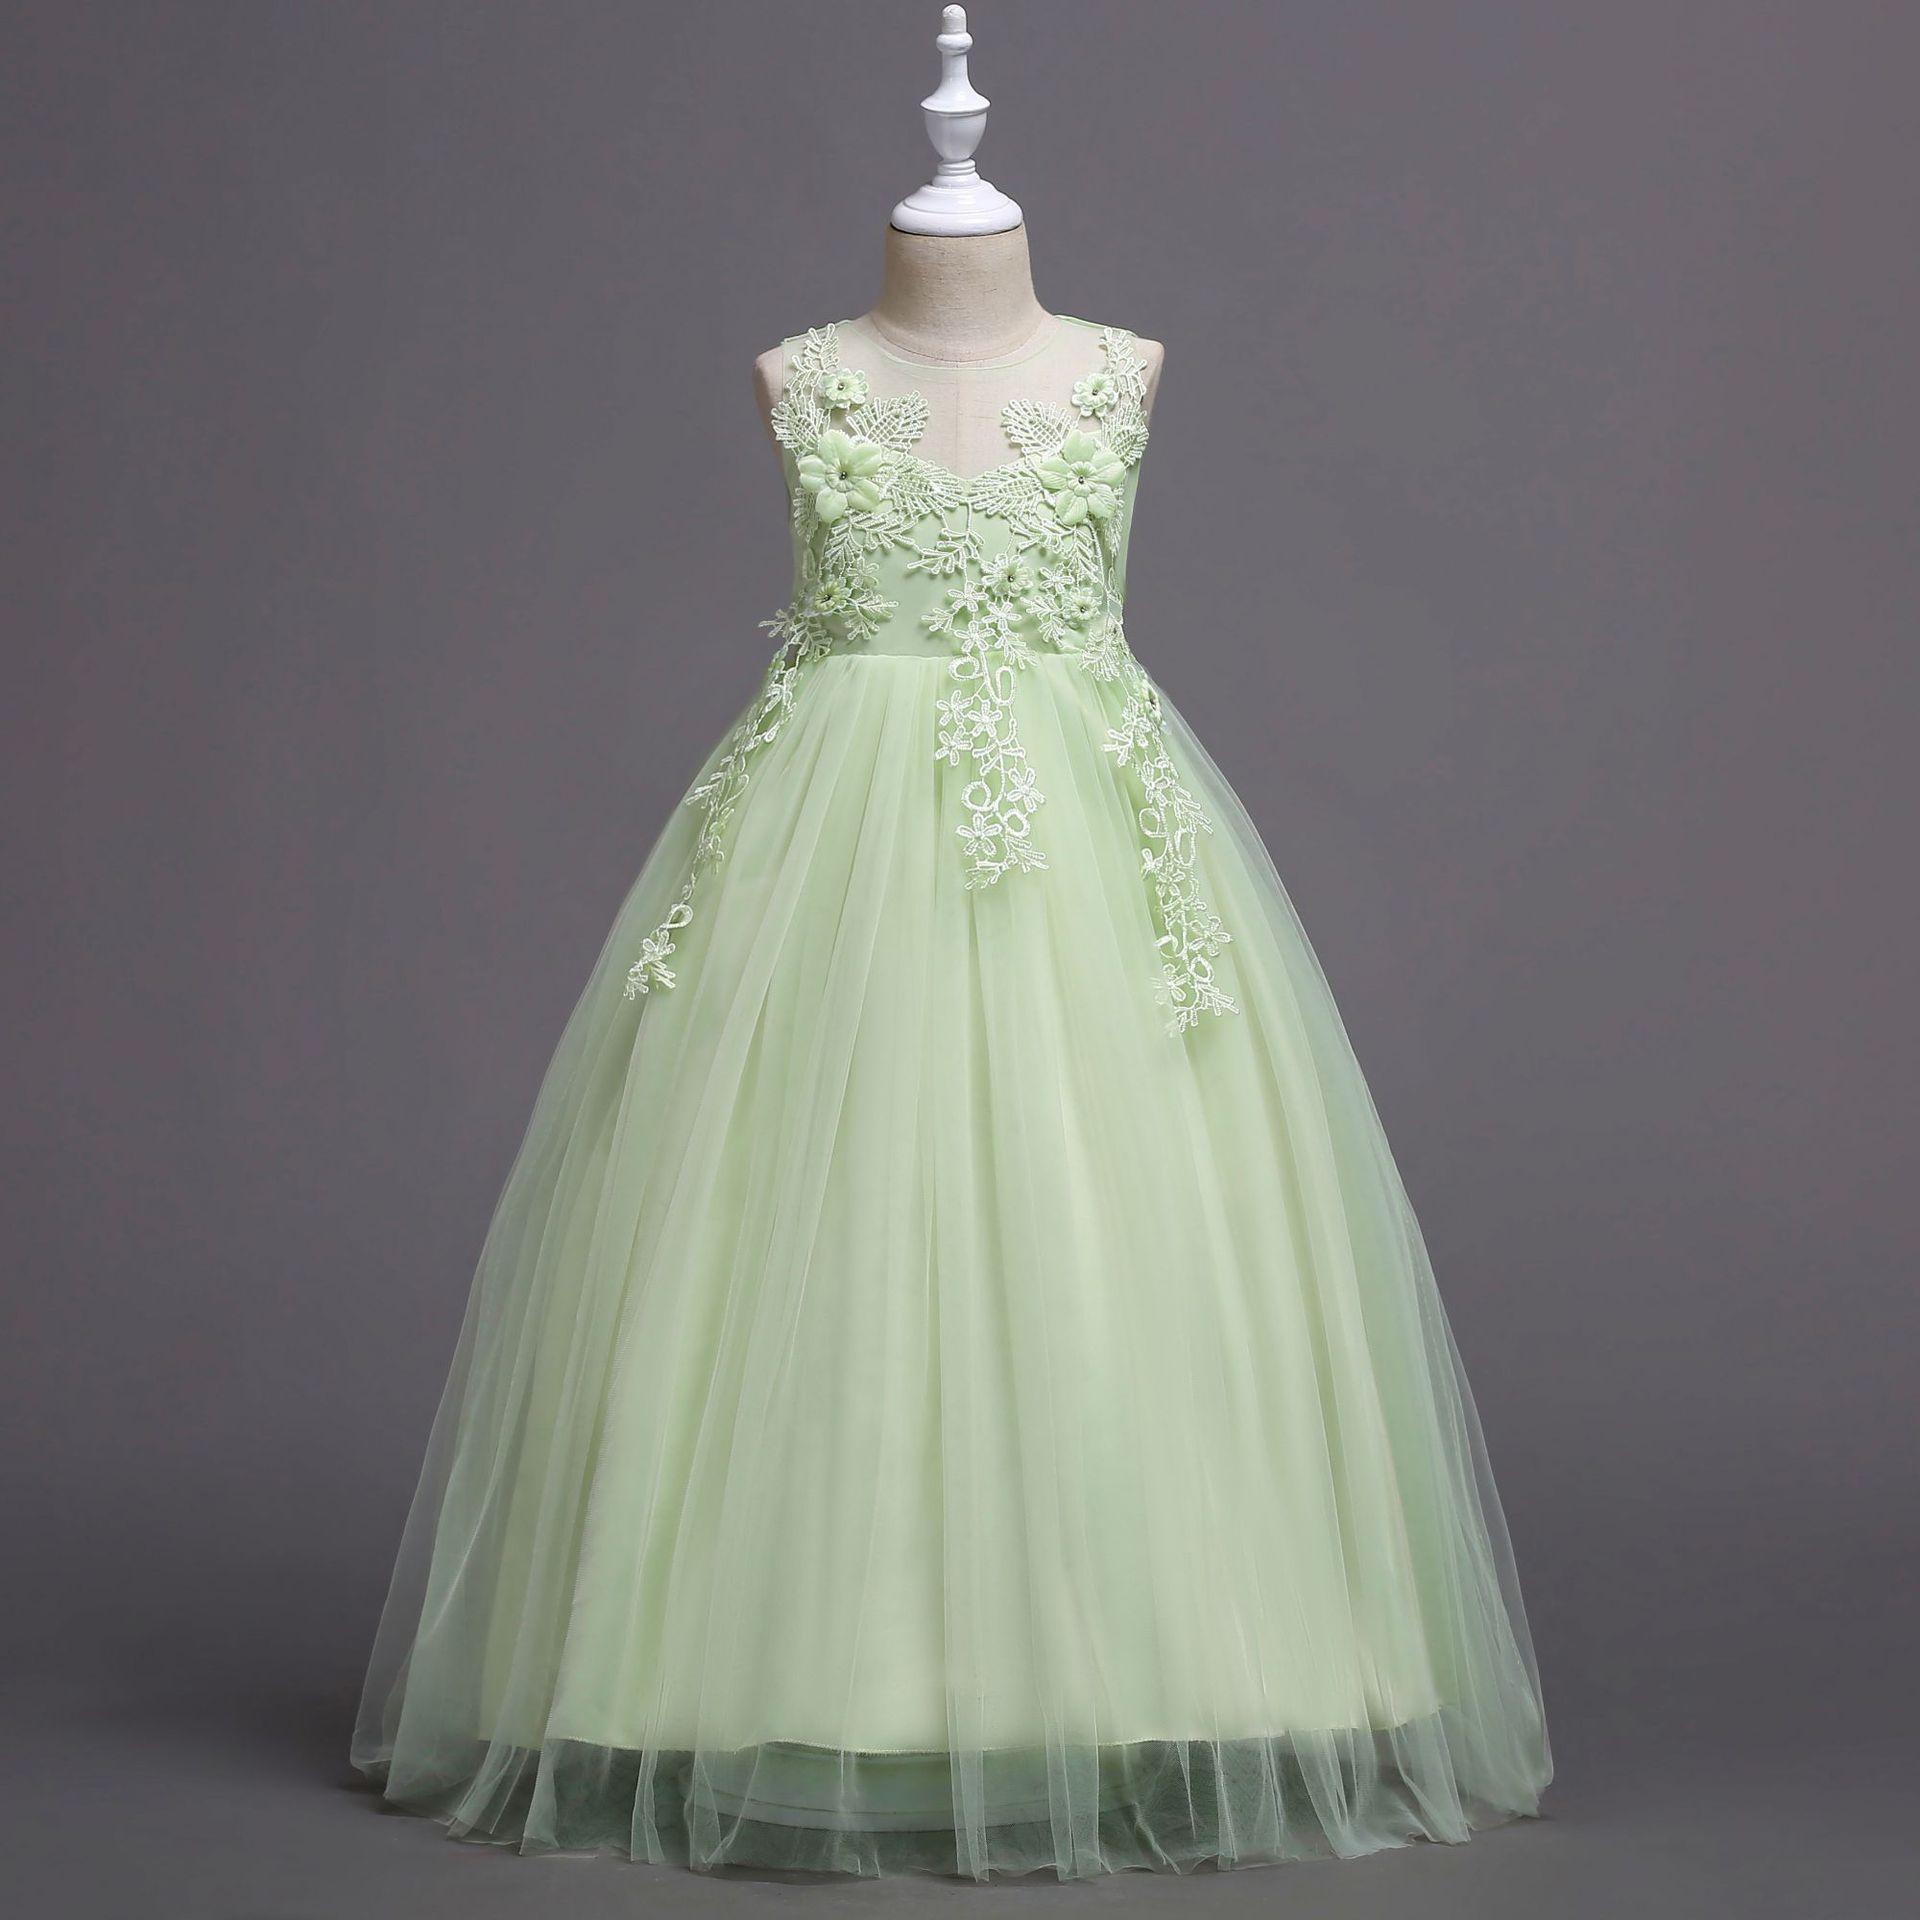 2019 Big Boy Embroidery Sleeveless Long Mopping Children Princess Dress Girls Performance Wedding Dress